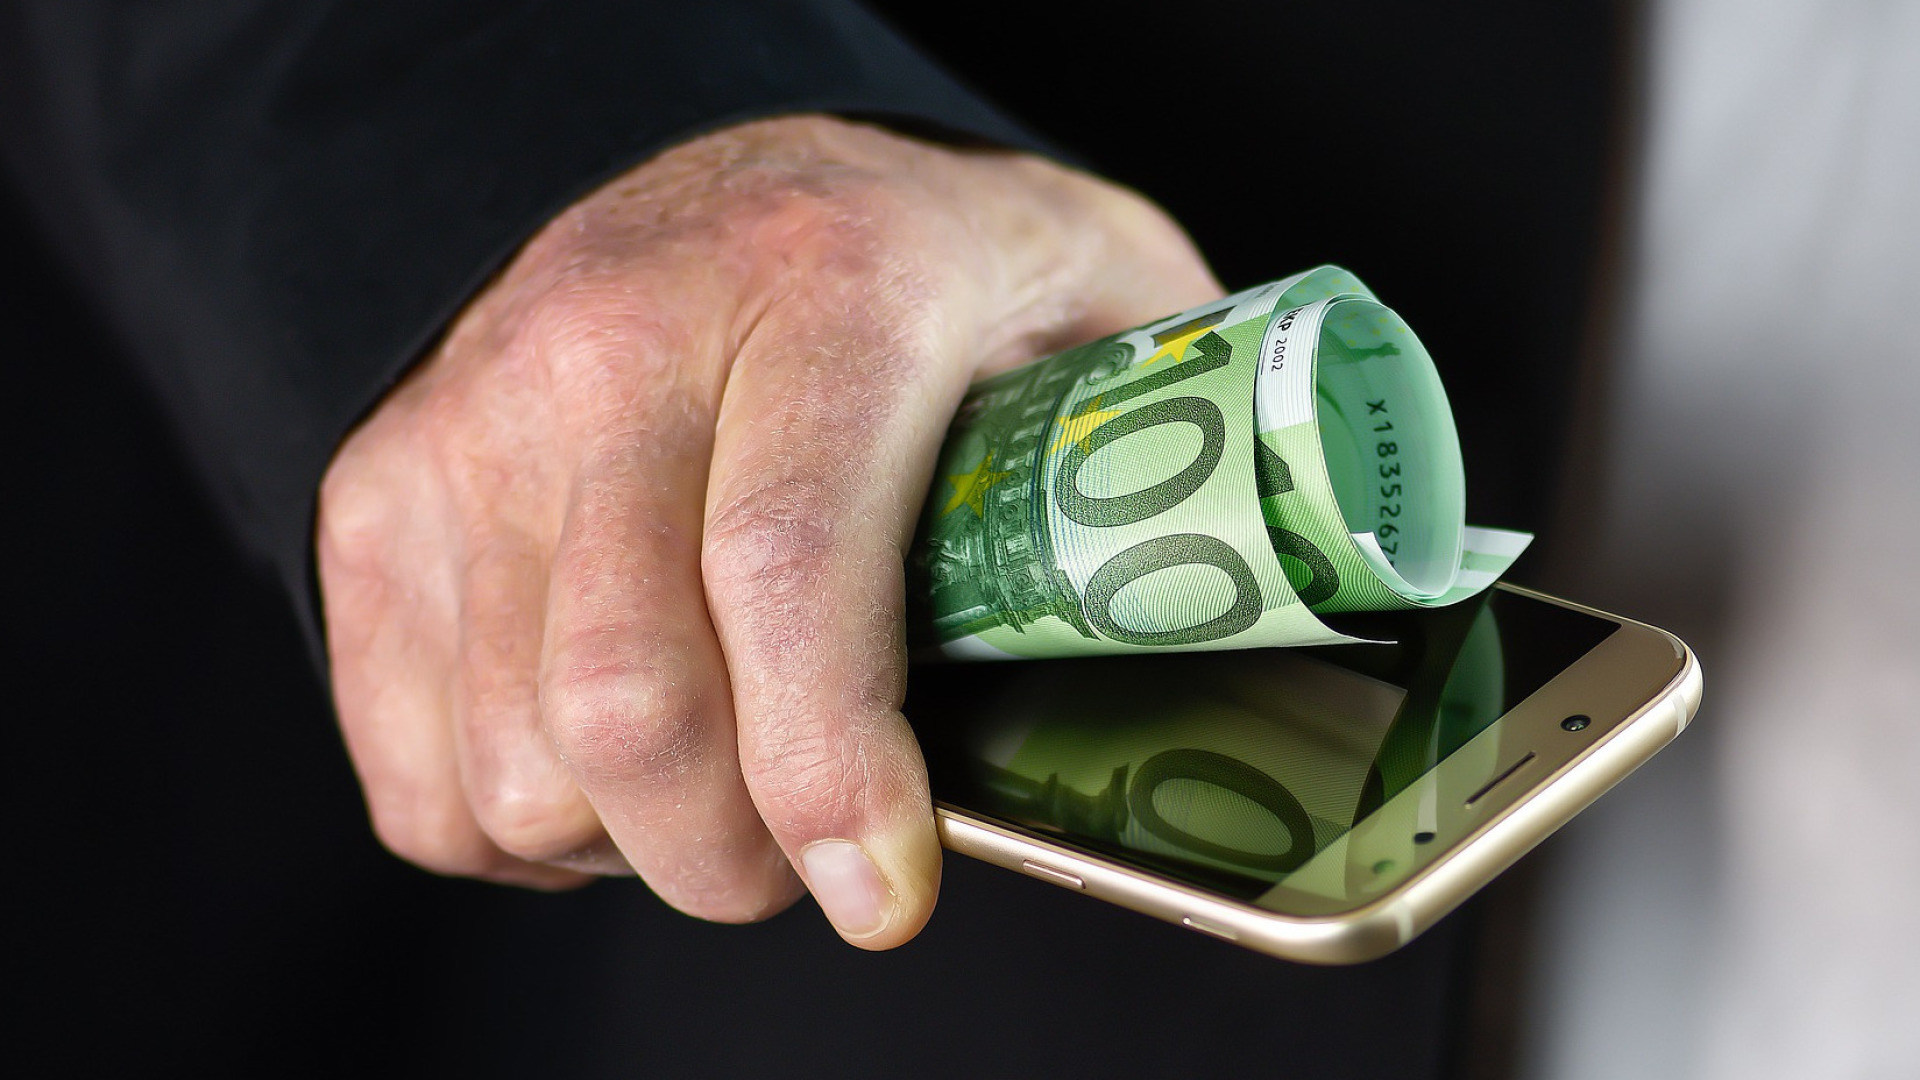 Smartphone, Geld, Bezahlen, Apple Pay, Google Pay, Kontaktloses Bezahlen